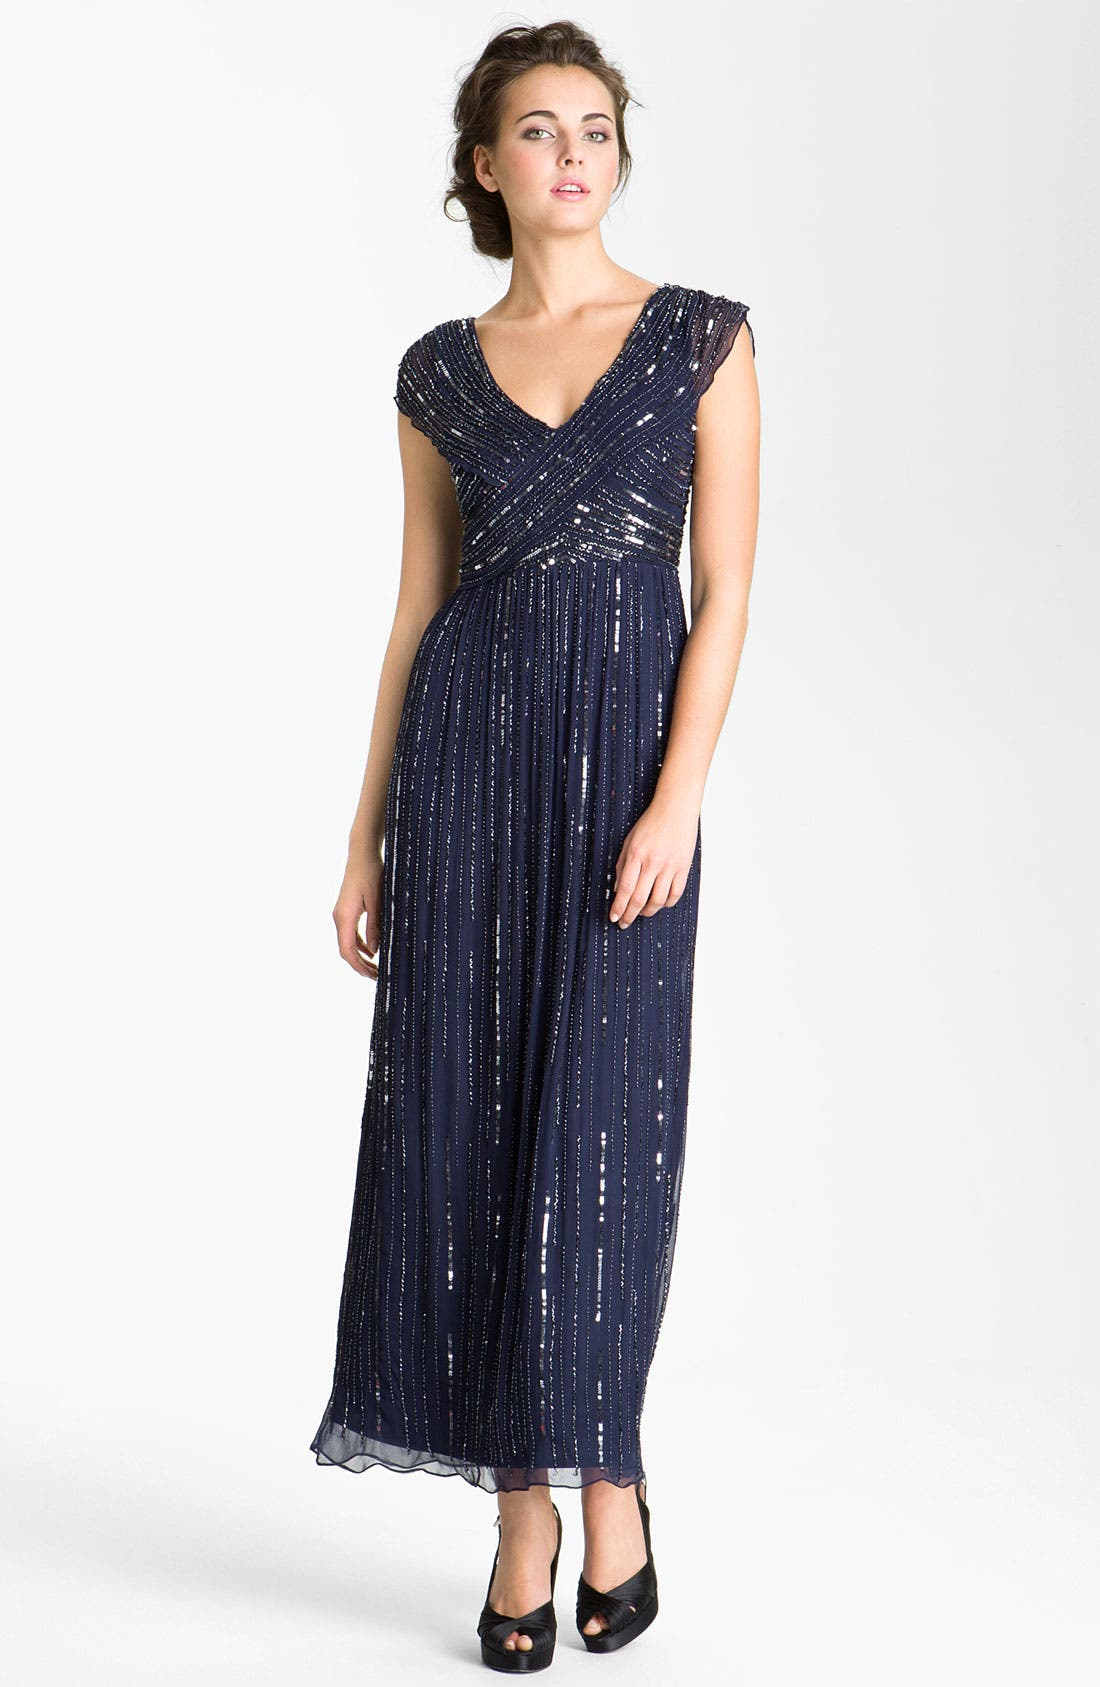 Alternate Image 1 Selected - Patra V-Neck Embellished Silk Chiffon Gown